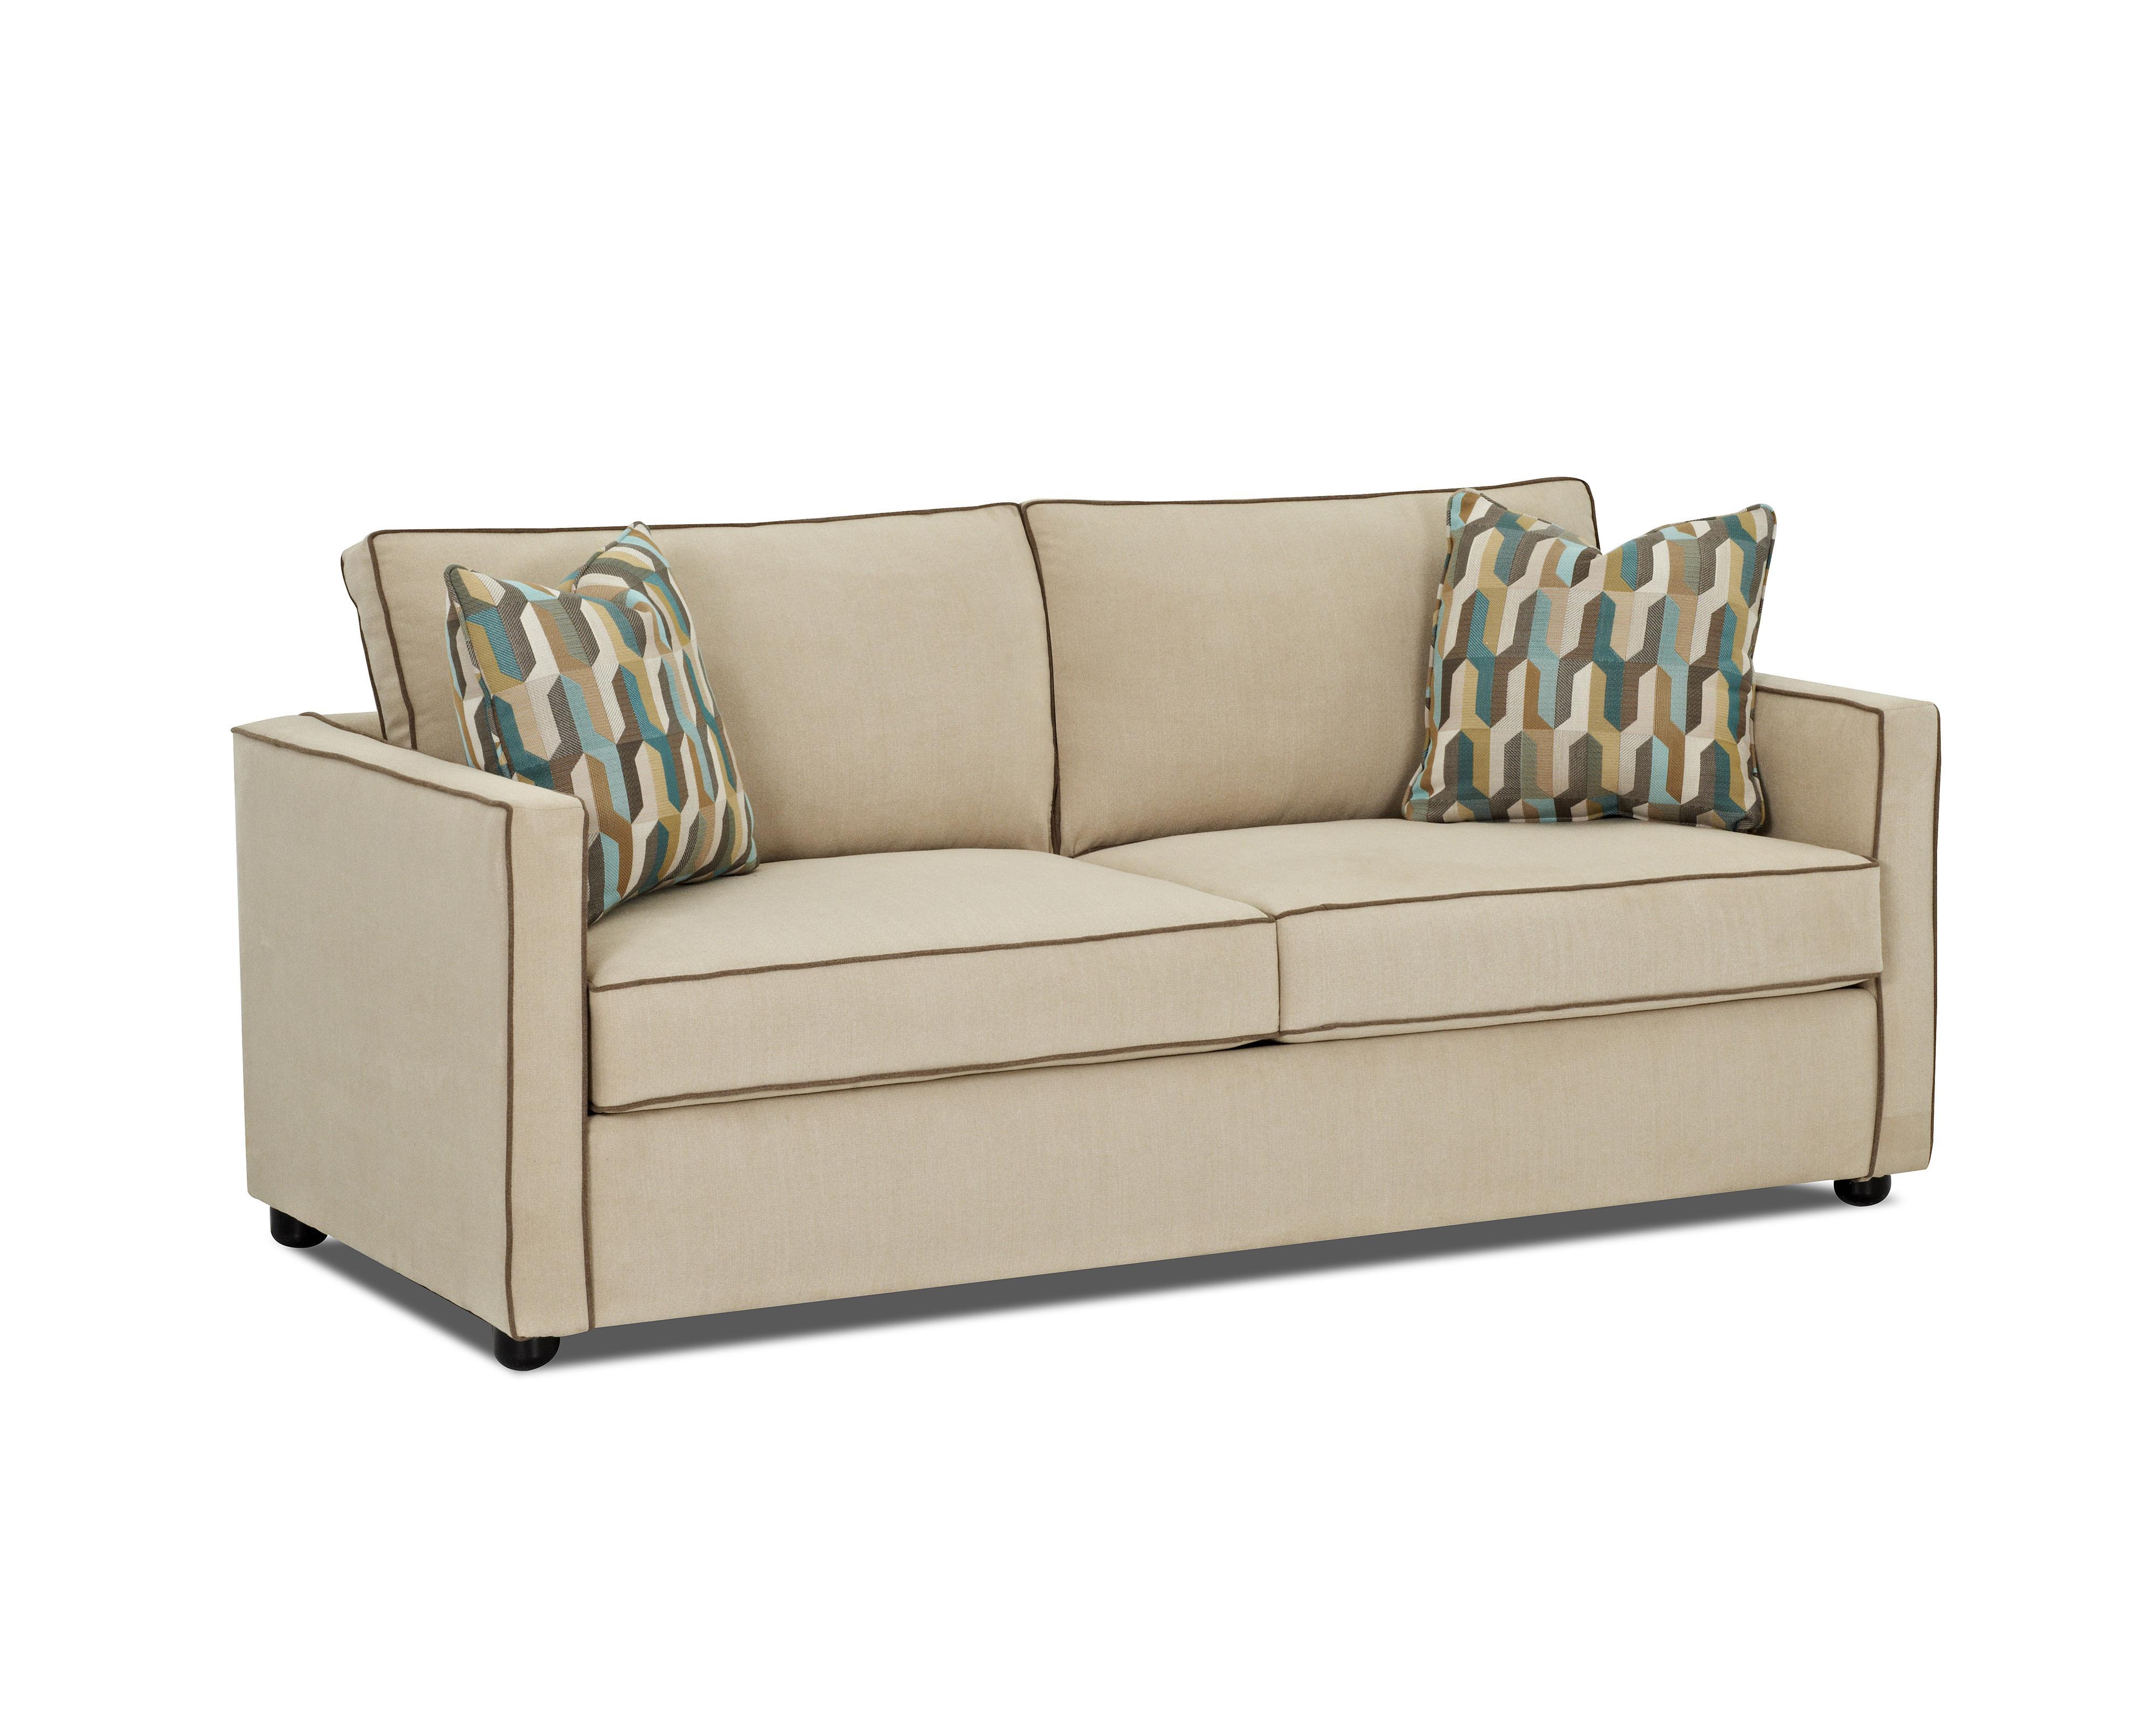 pendry contemporary queen enso memory foam sleeper sofa. Black Bedroom Furniture Sets. Home Design Ideas